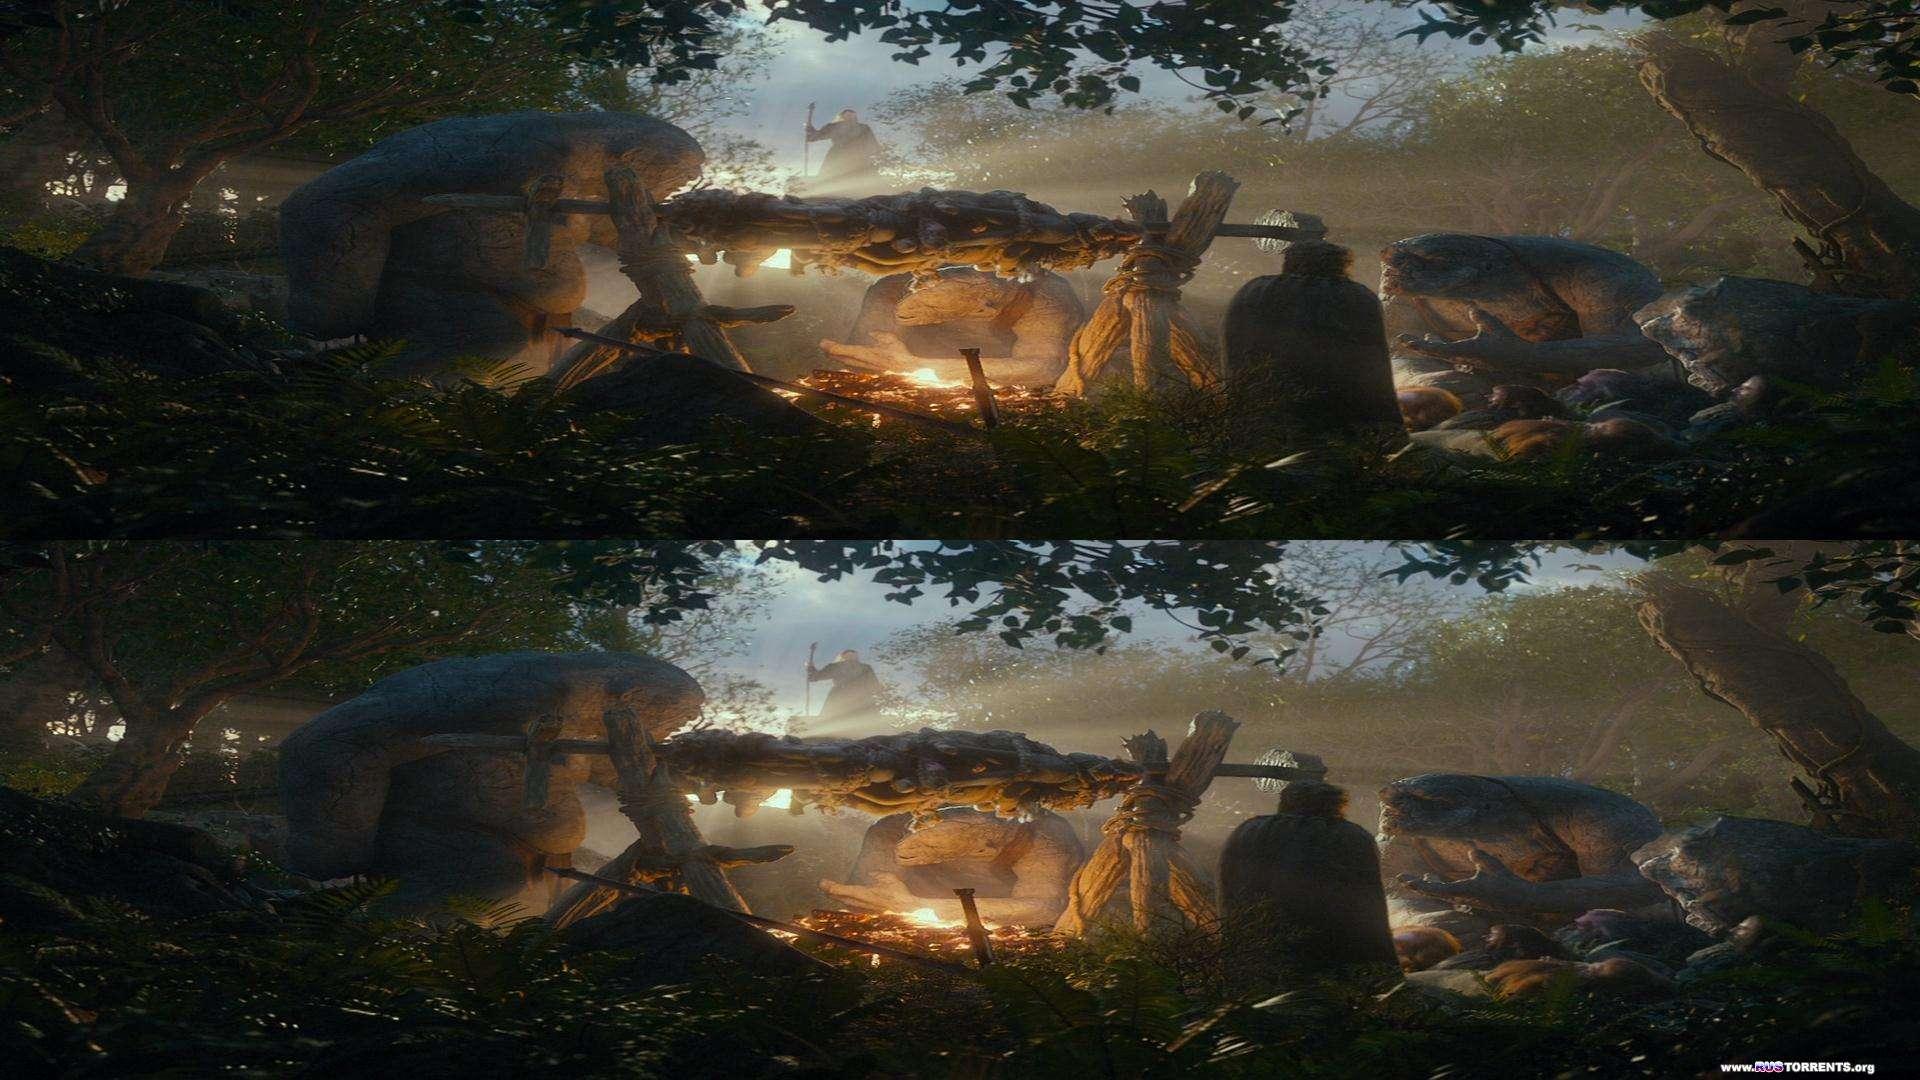 Хоббит: Нежданное путешествие | BDRip 1080p | 3D-Video | Crop